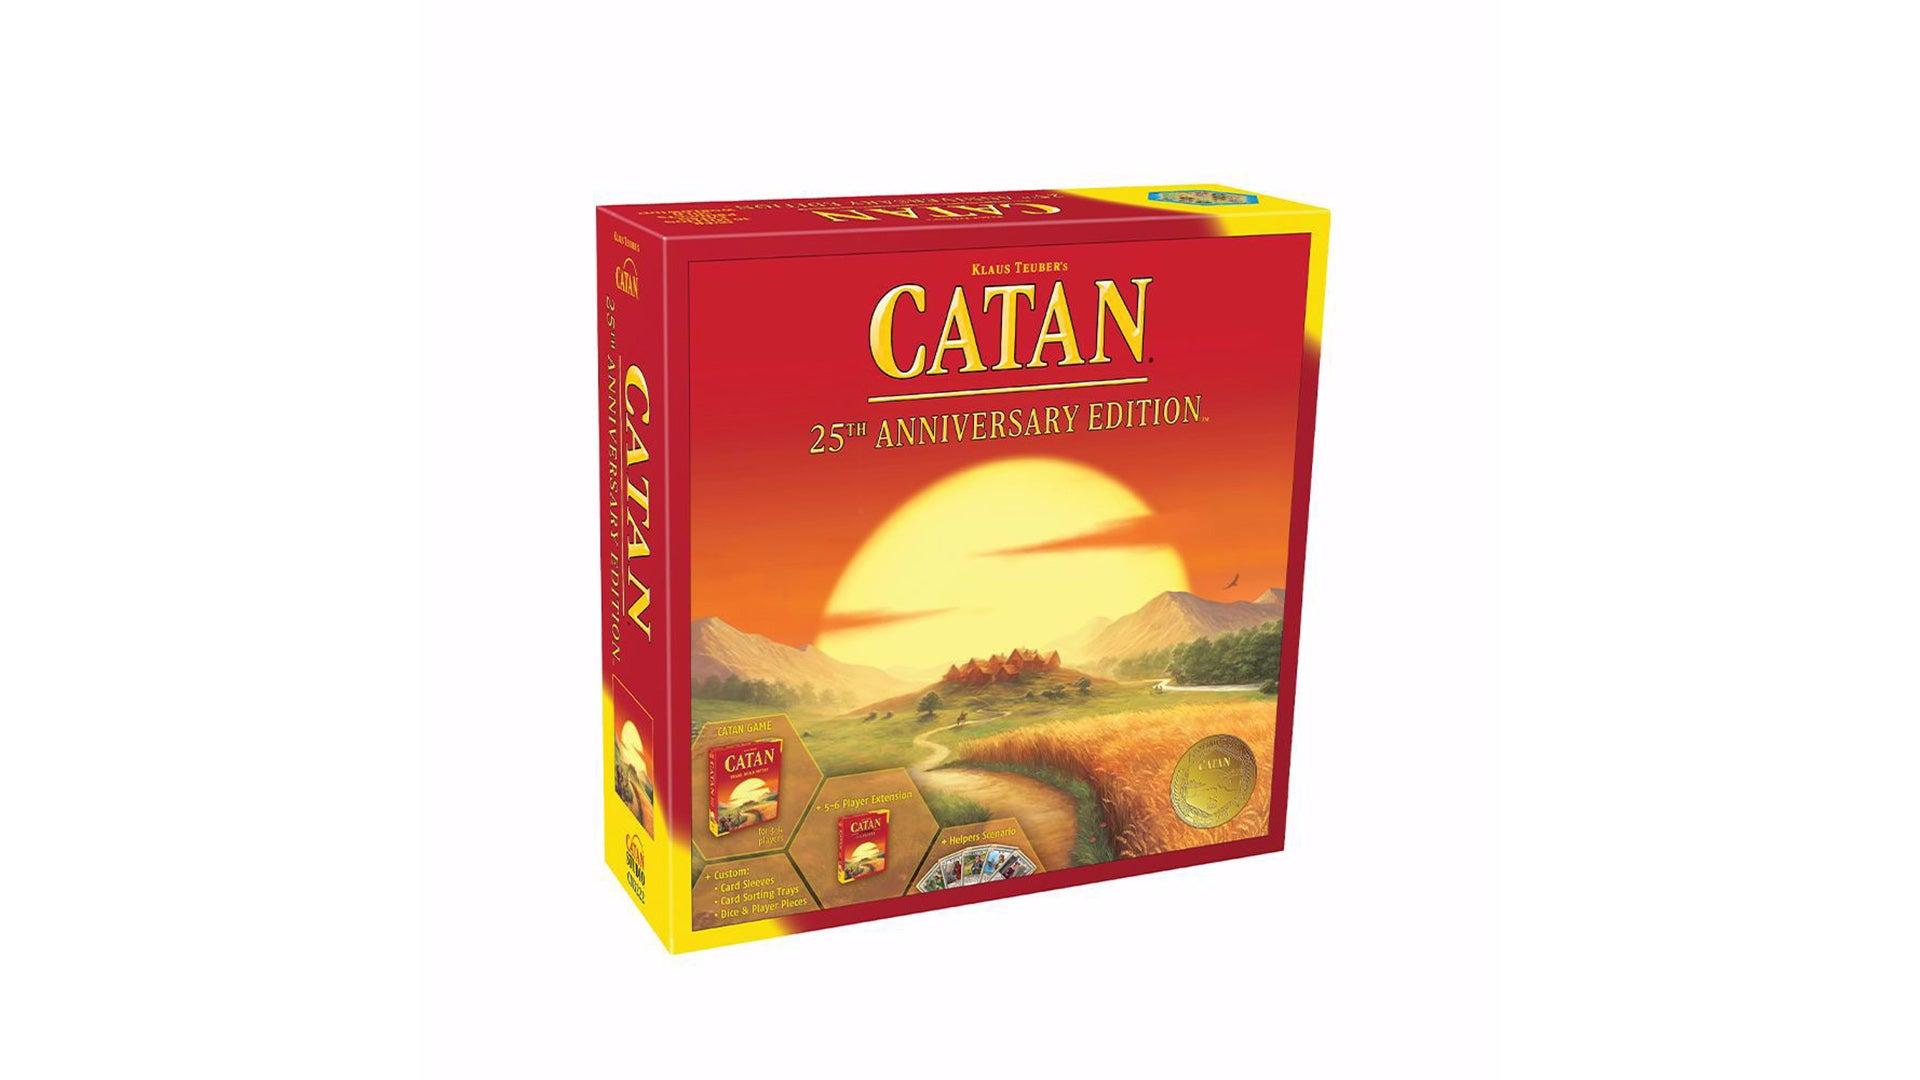 CATAN: 25th Anniversary